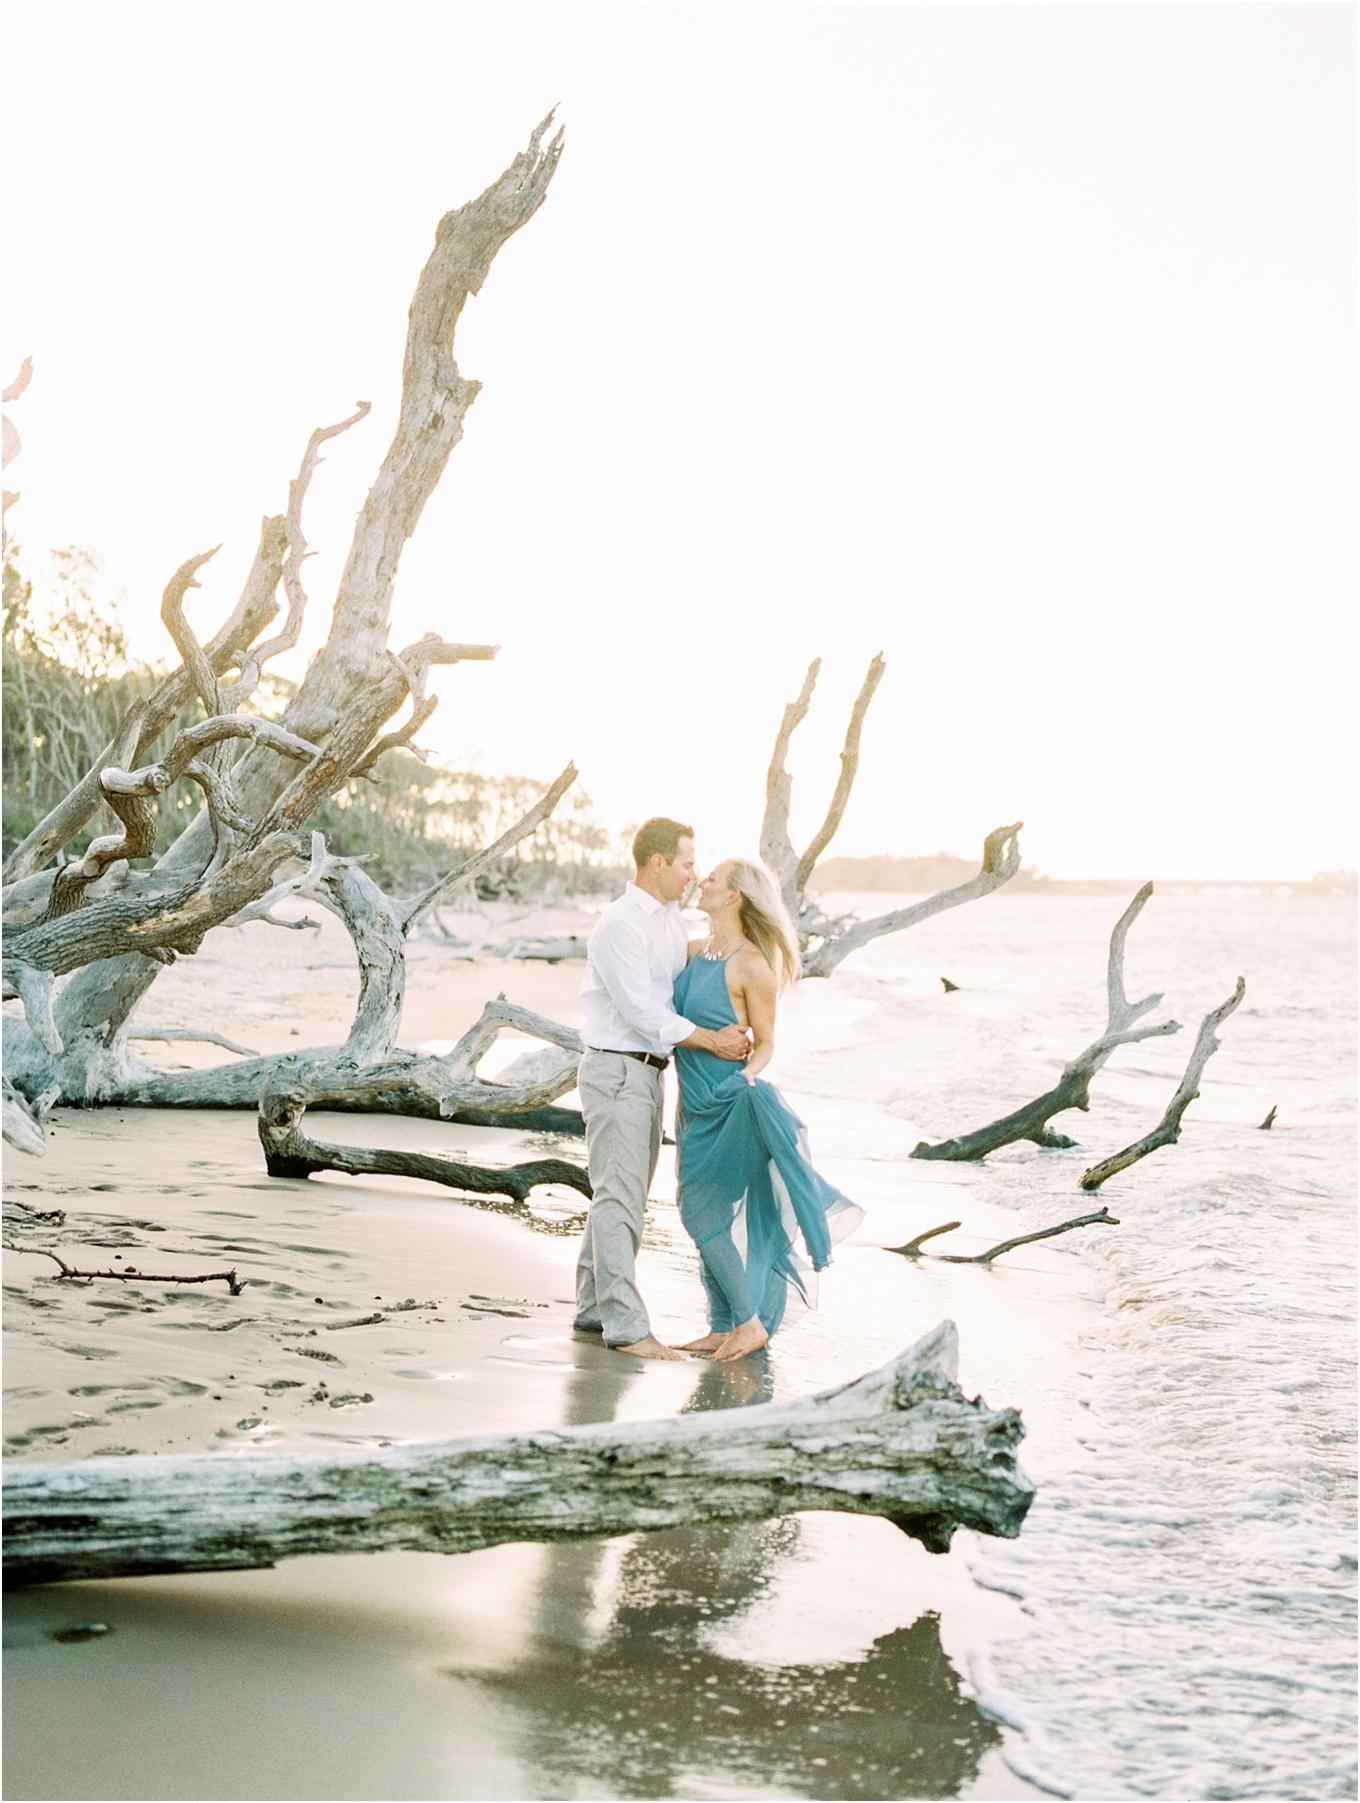 Lisa Silva Photography- Ponte Vedra Beach and Jacksonville, Florida Fine Art Film Wedding Photography- Engagement Shoot at Big Talbot Island_0032.jpg